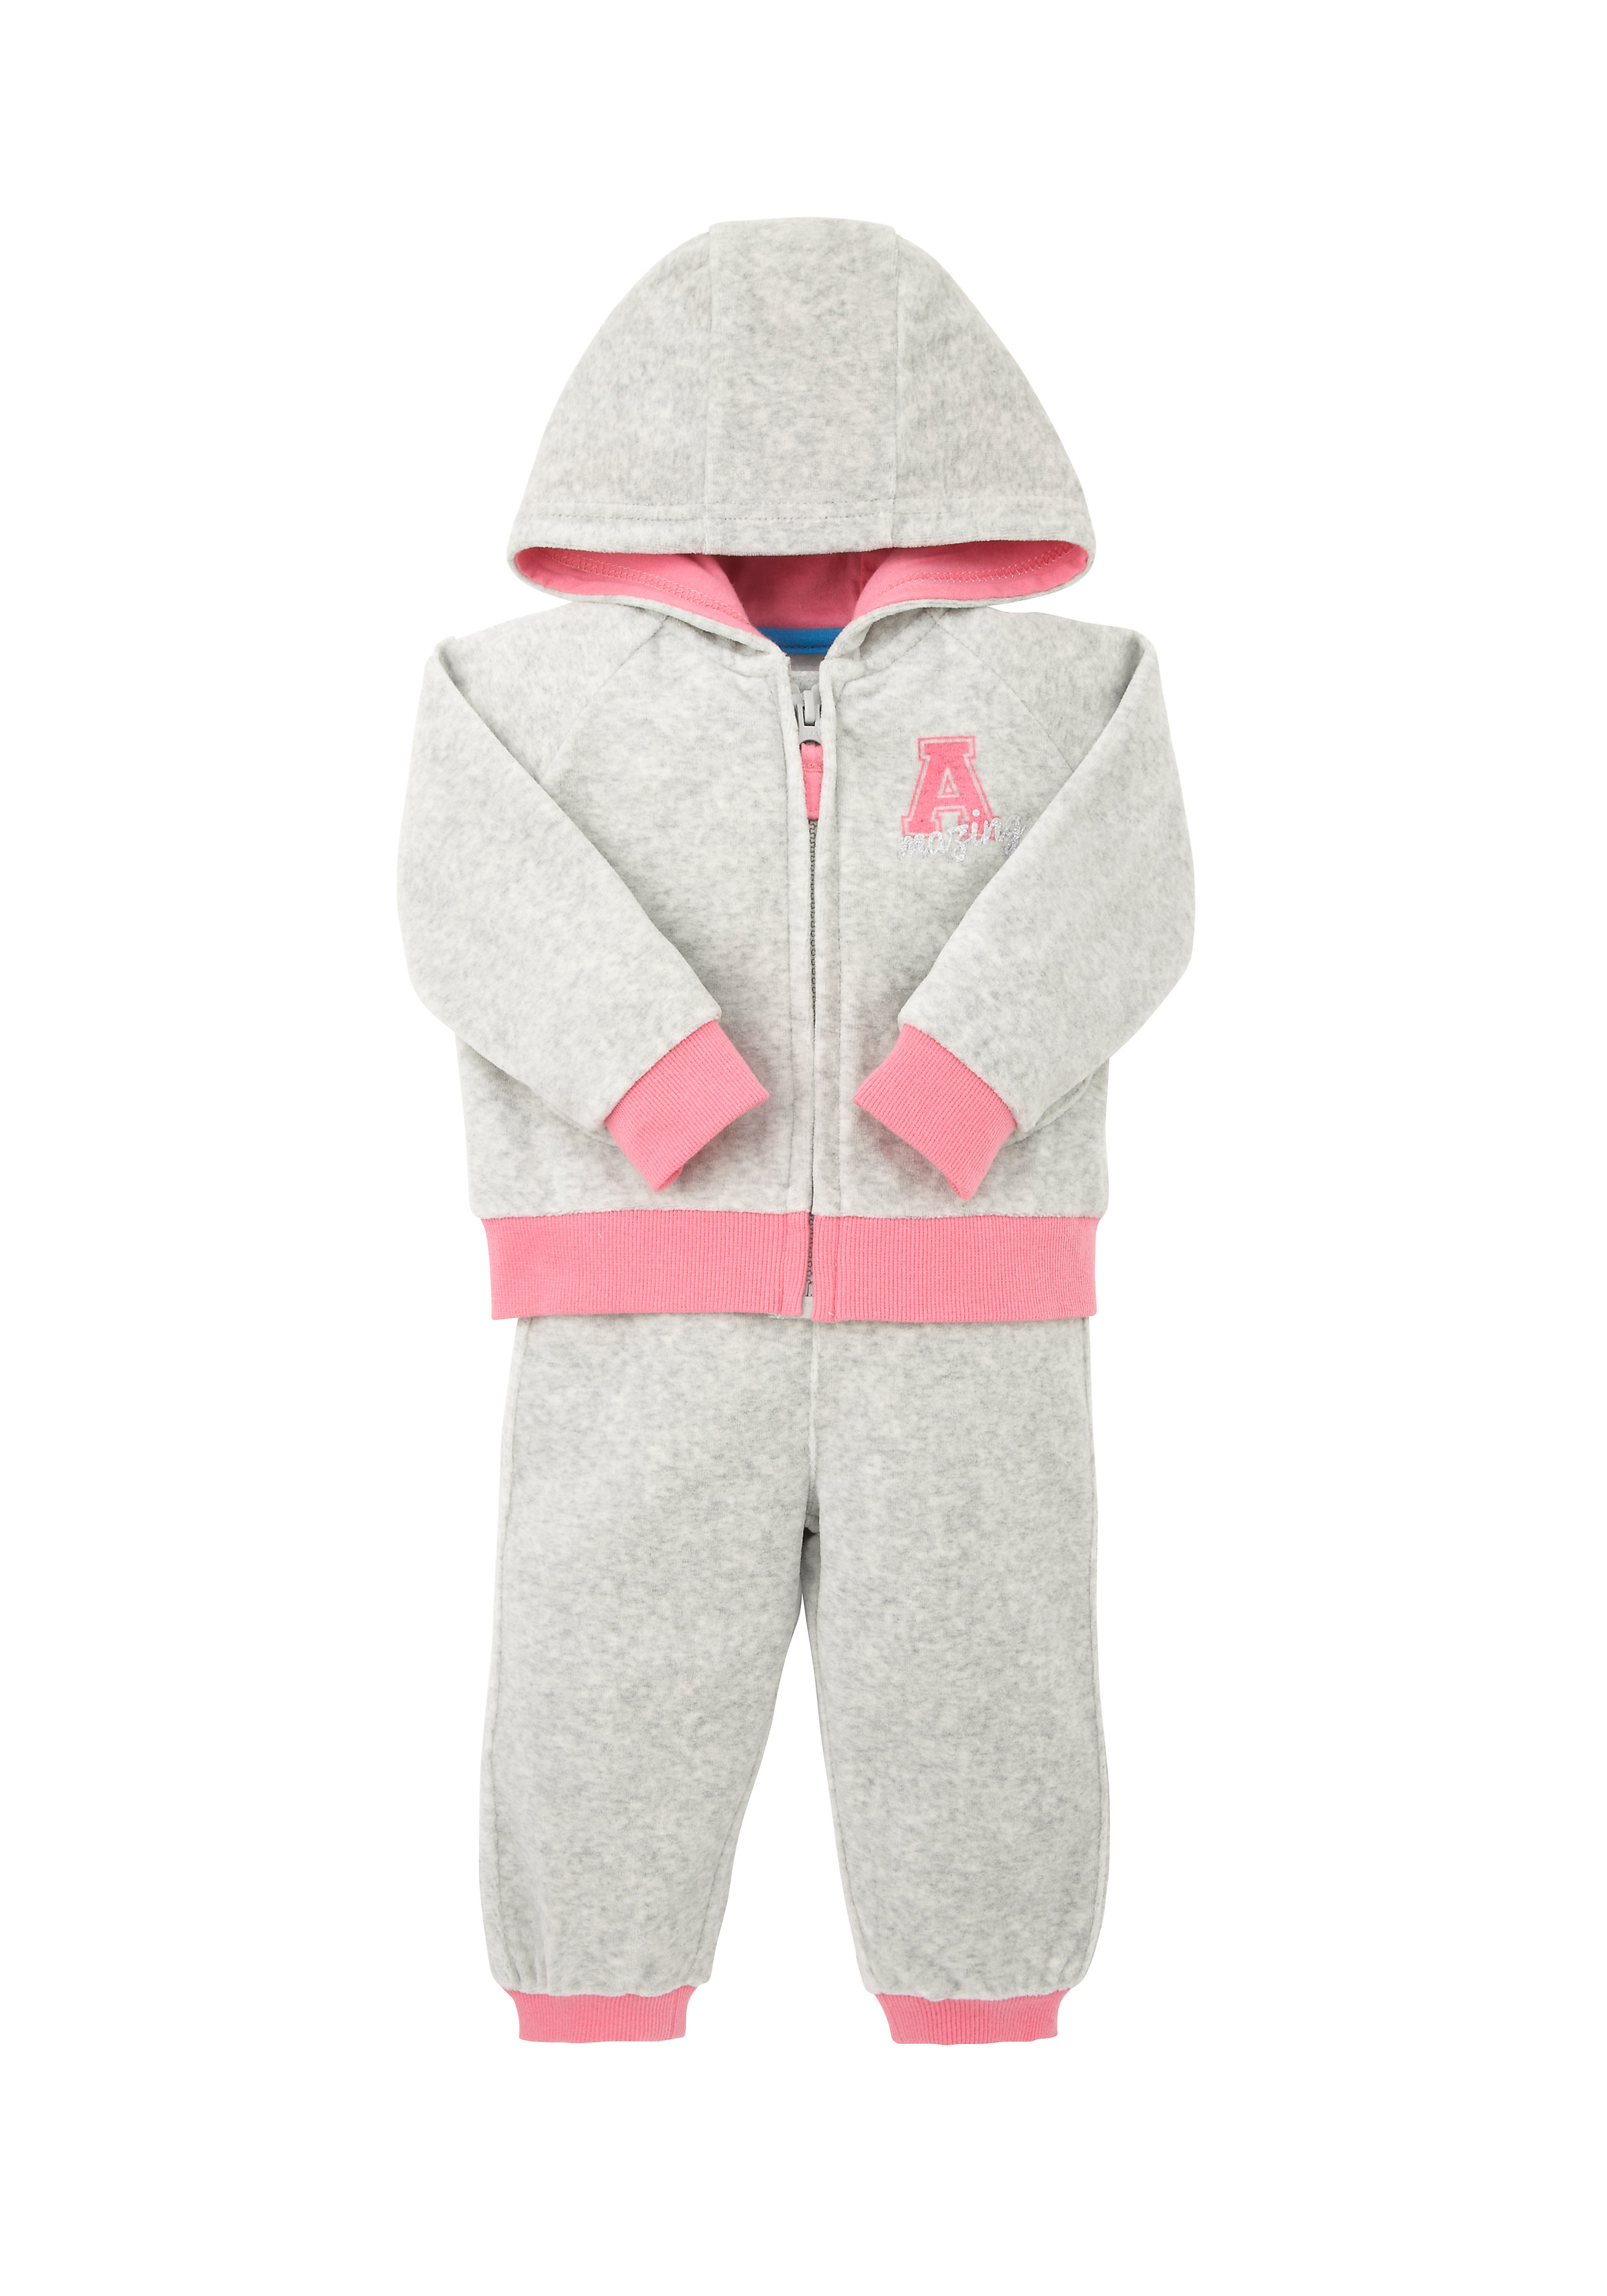 Mothercare | Girls Full Sleeves Velour Top And Jogger Set Glitter Print - Grey